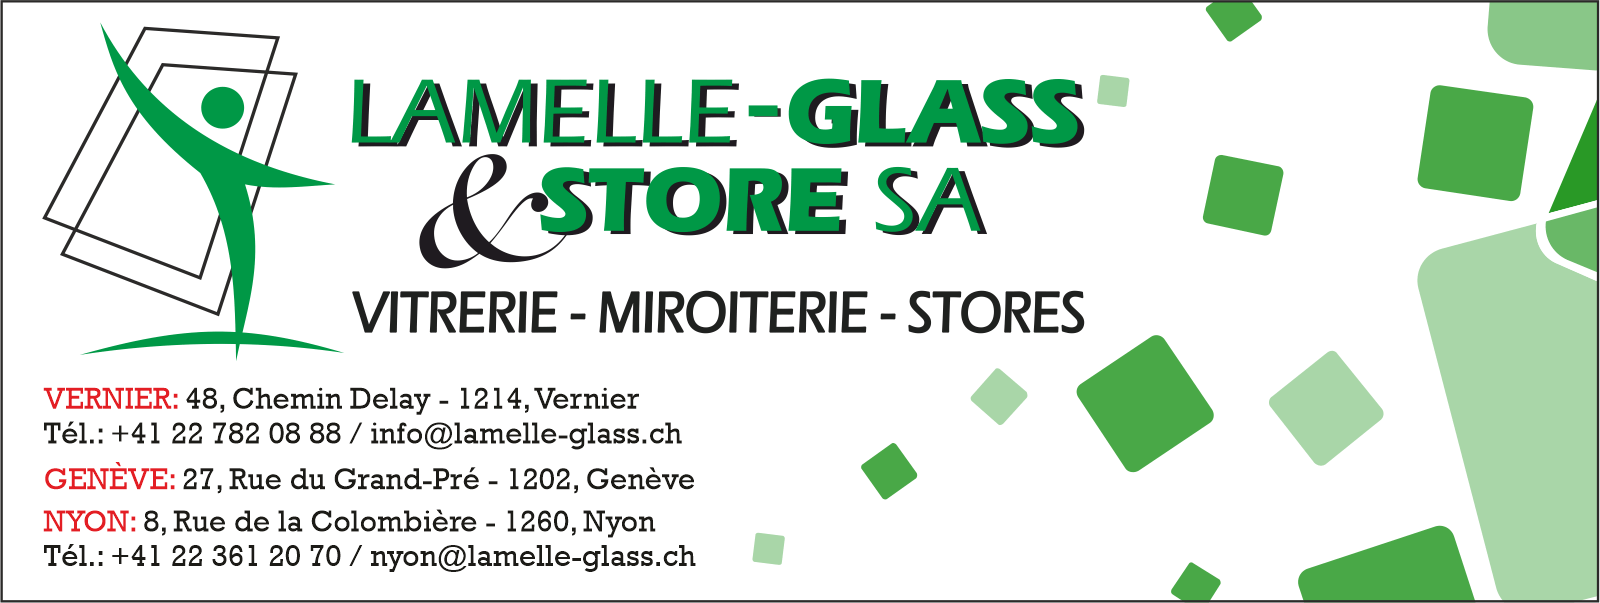 Lamelle-Glass & Store SA